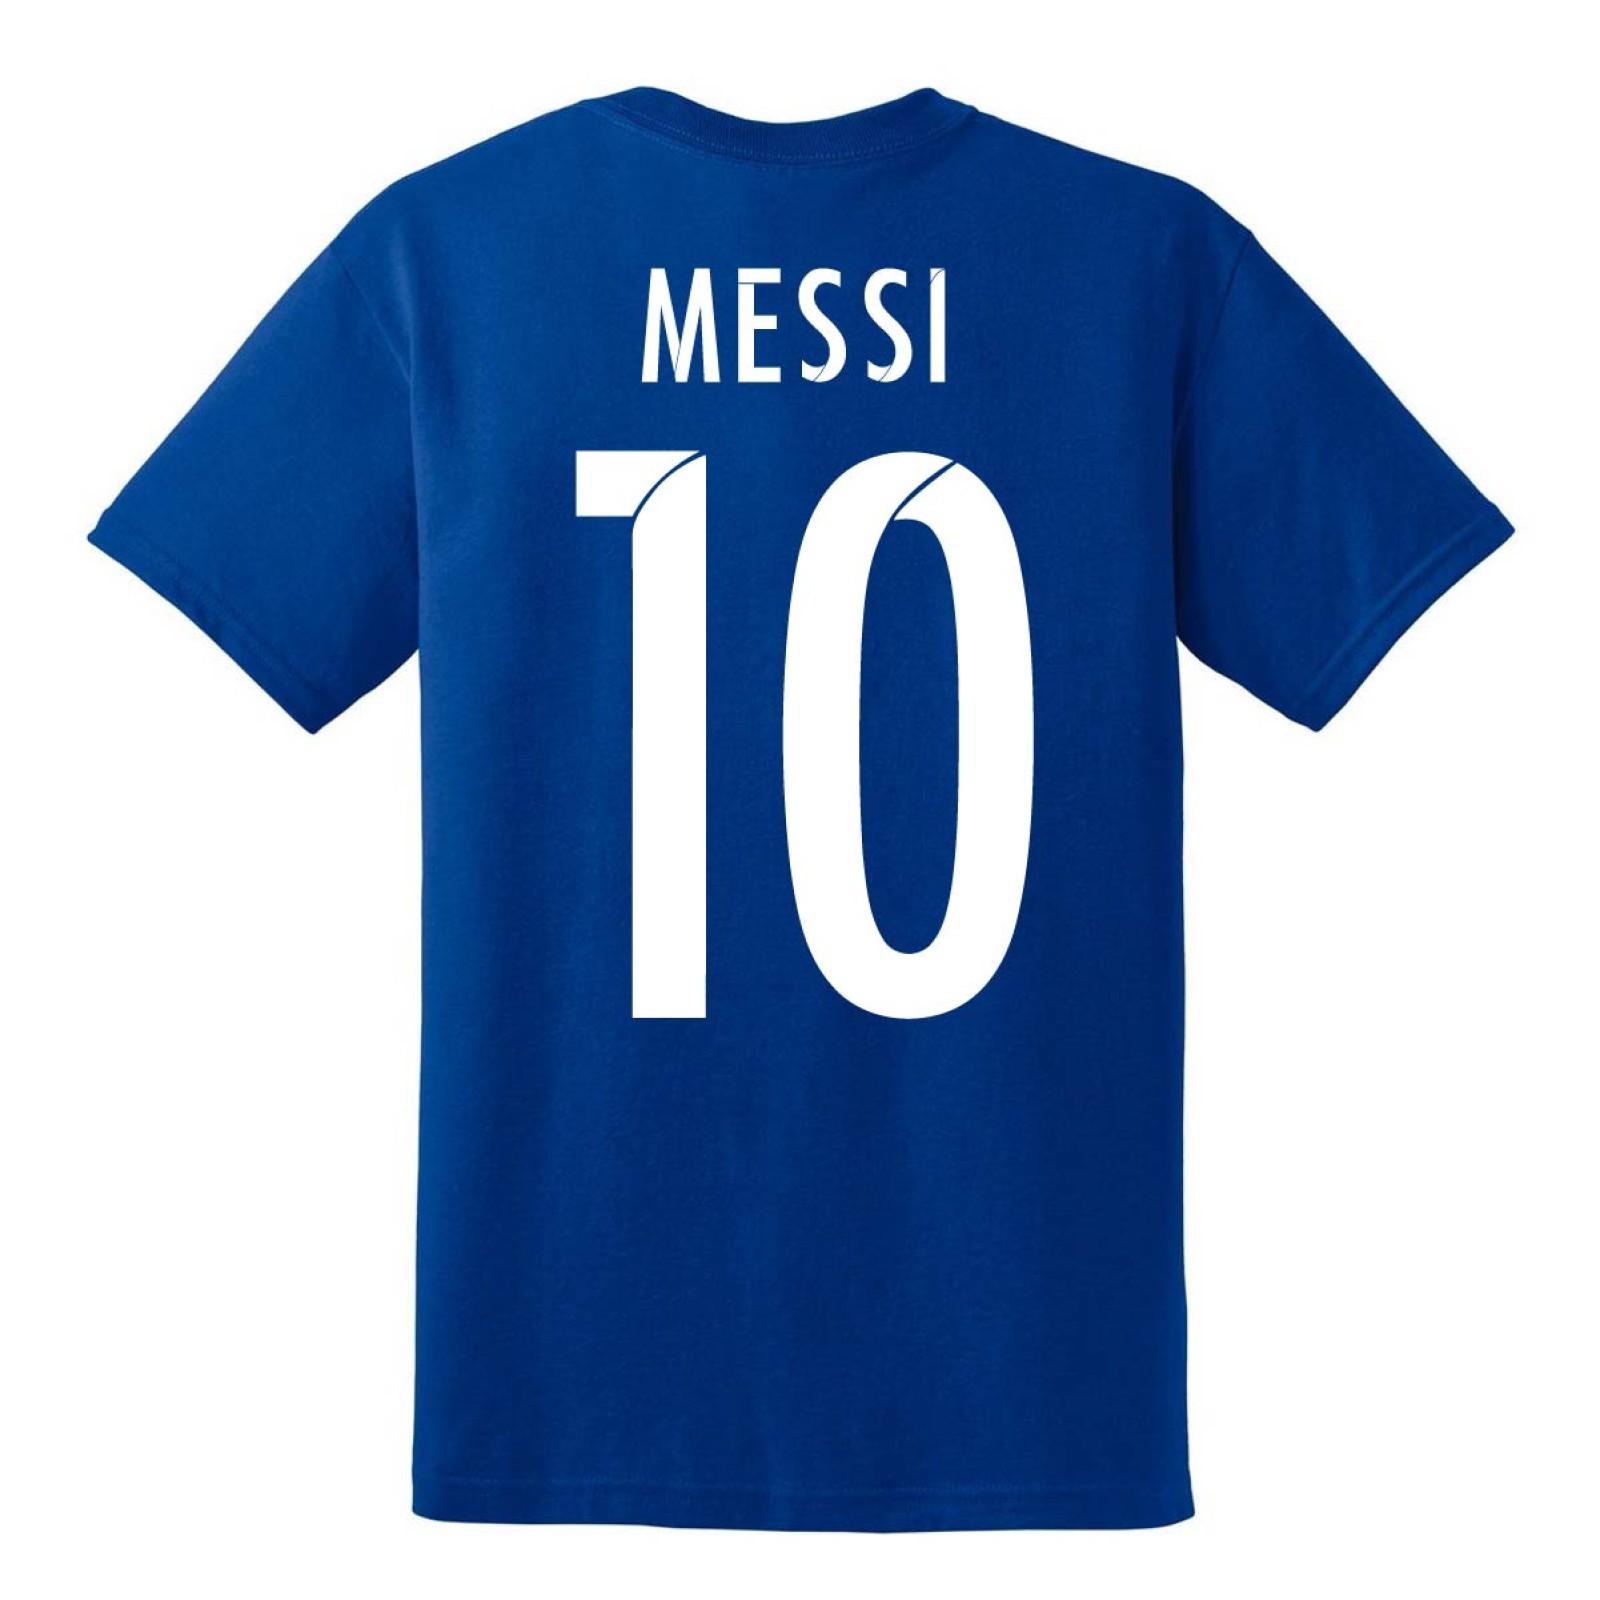 Messi Crest T-Shirt